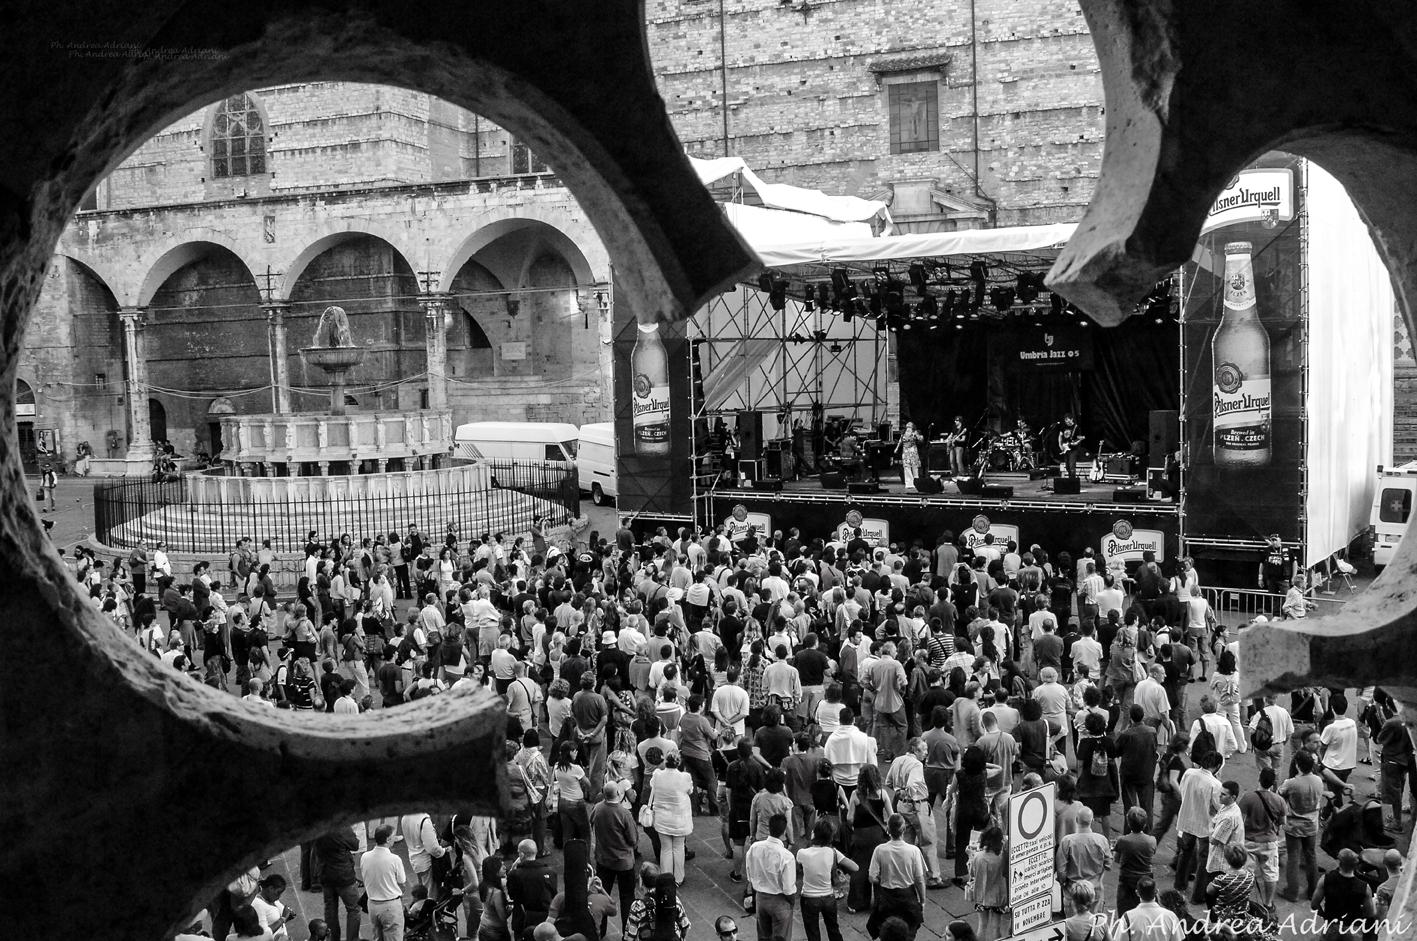 Umbria Jazz Festival, Perugia, Fotografia di Andrea Adriani